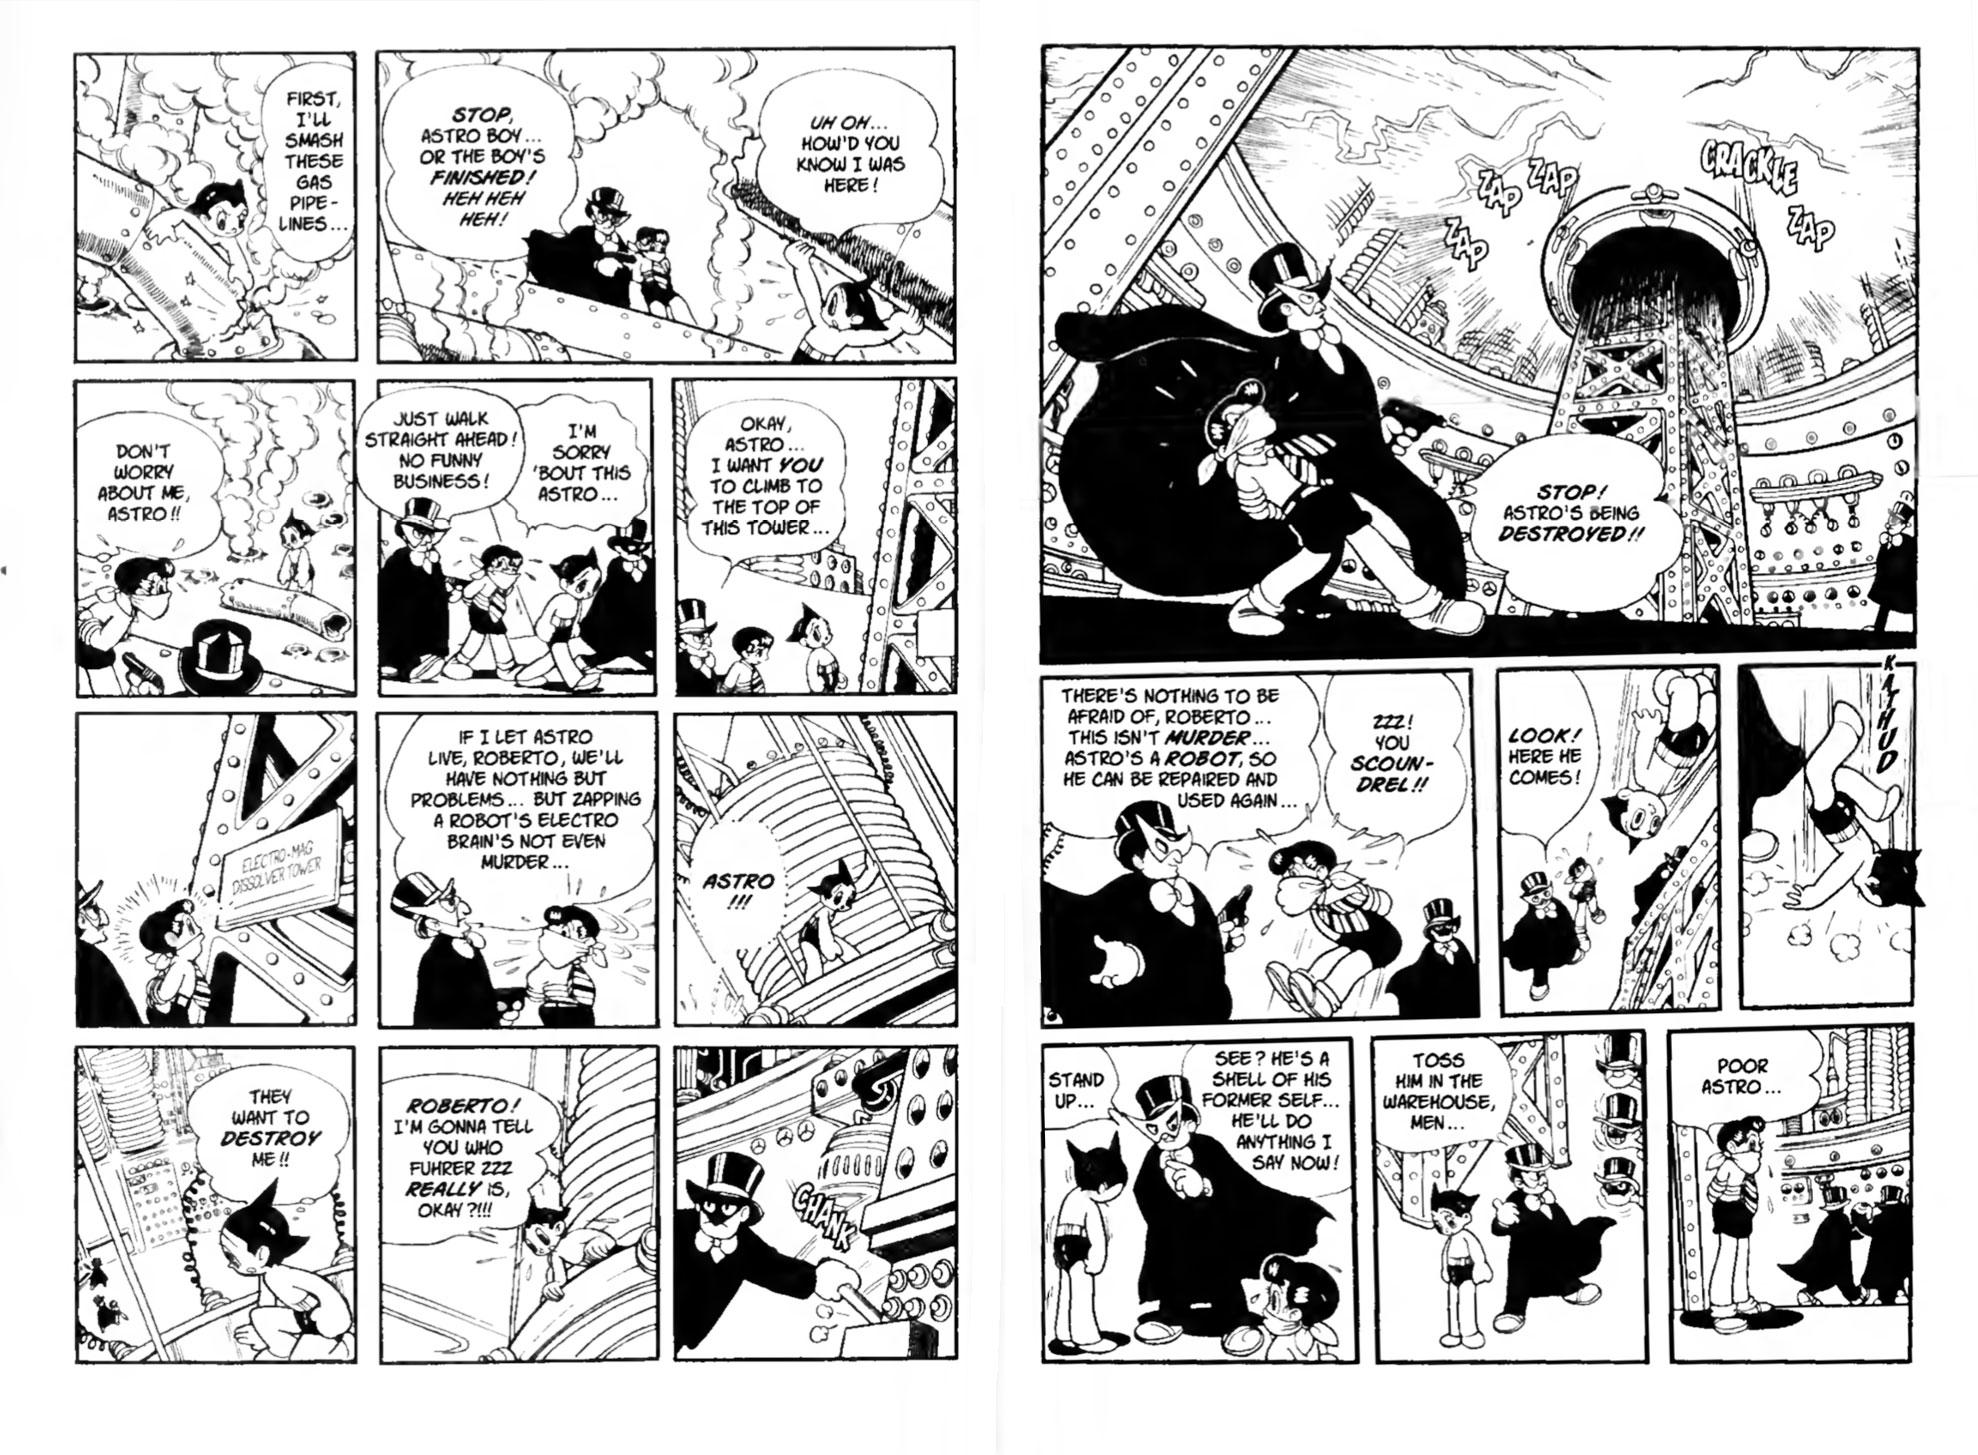 Astro Boy 17 review